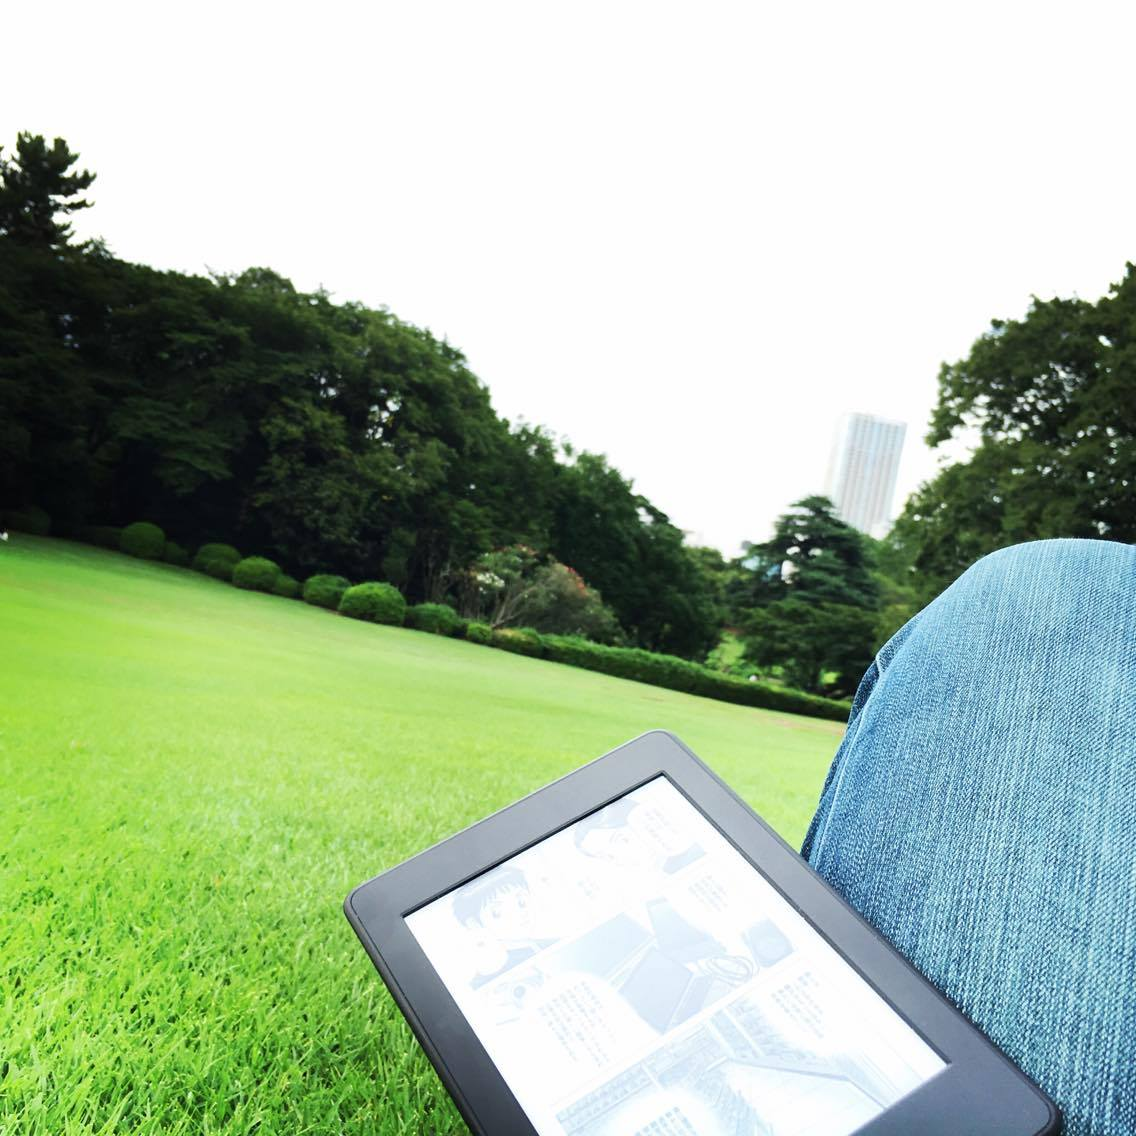 Kindle Unlimited 読み放題の感想!種類も豊富で便利!